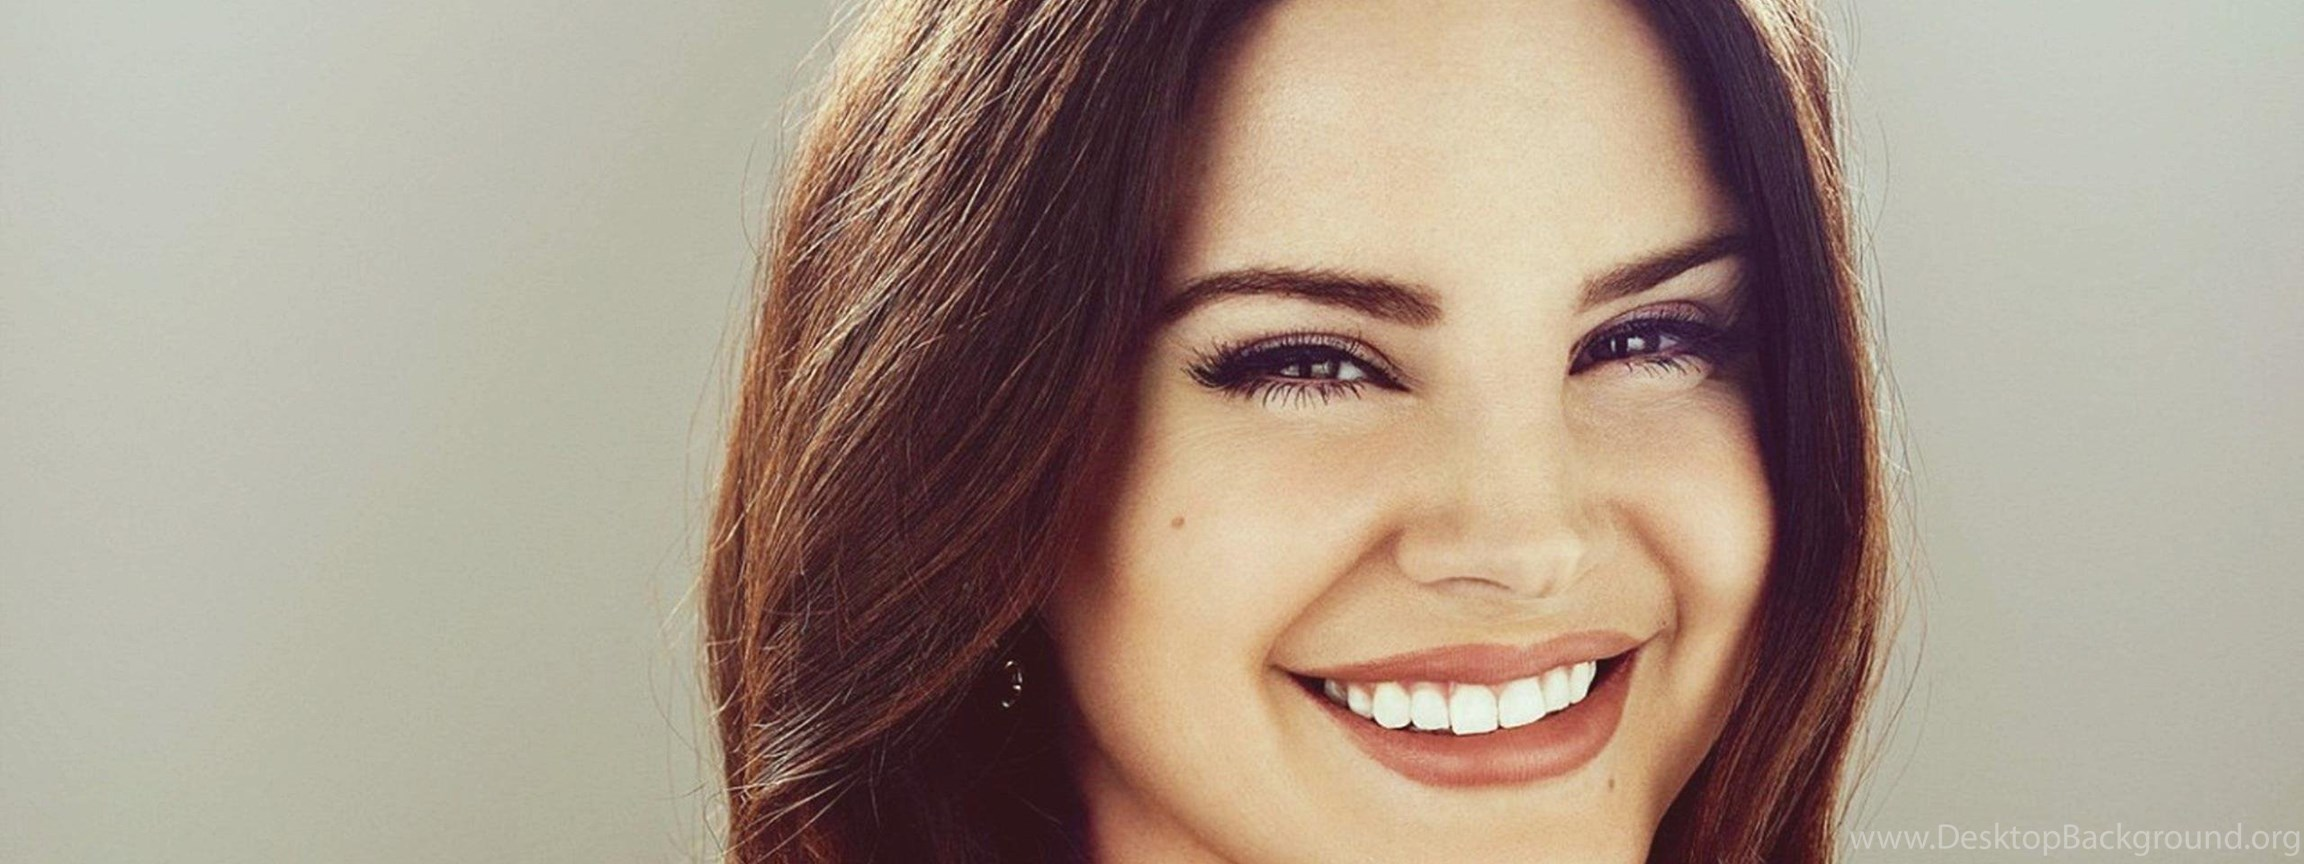 Lana Del Rey Cute Smile Wallpapers Desktop Background